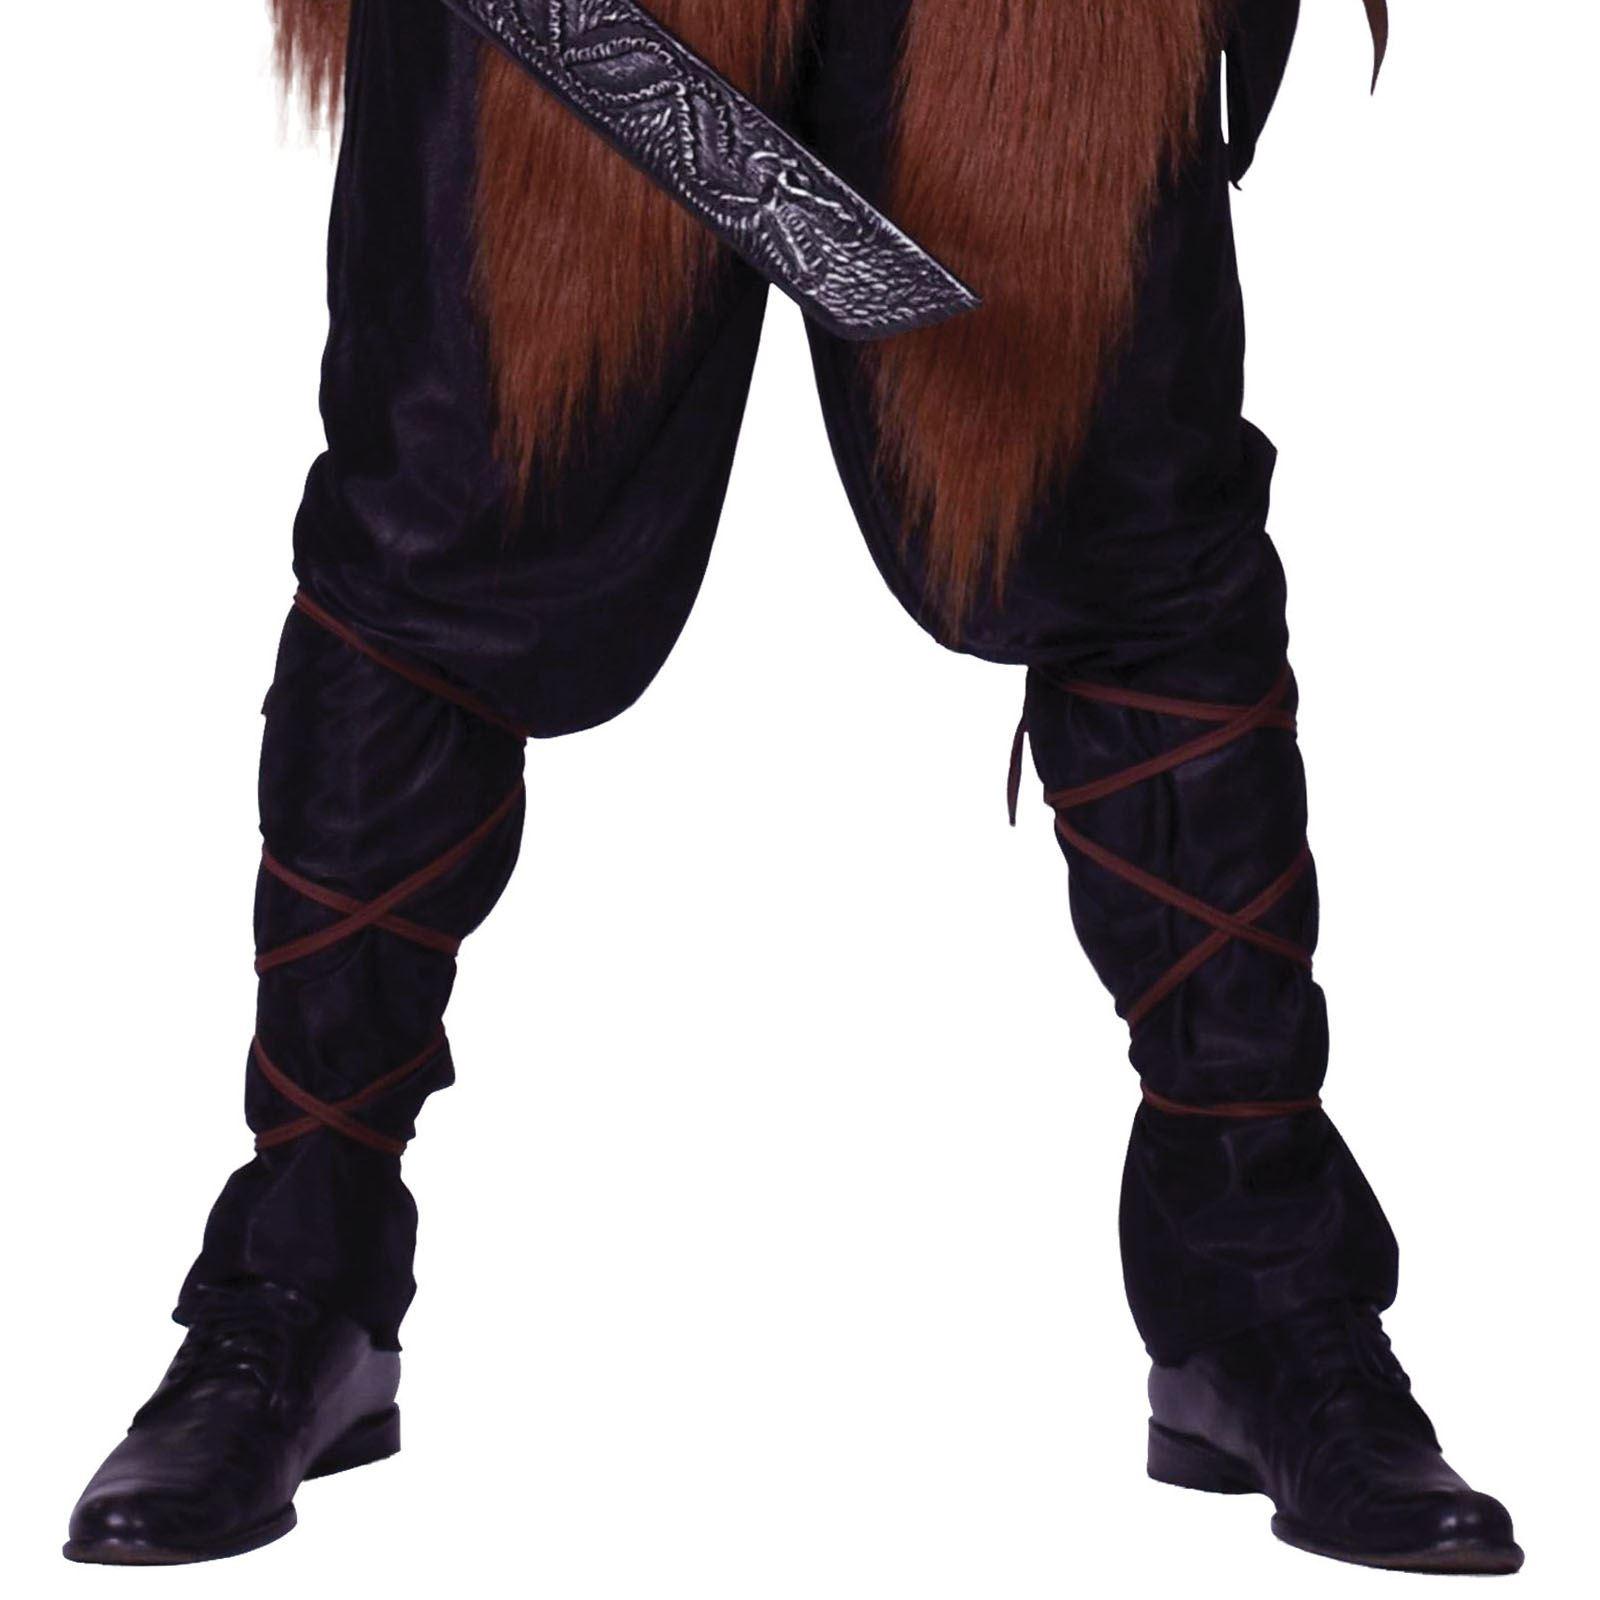 herren barbar wikinger kost m mittelalter pelz s chsisch herrenabend warrior l ebay. Black Bedroom Furniture Sets. Home Design Ideas